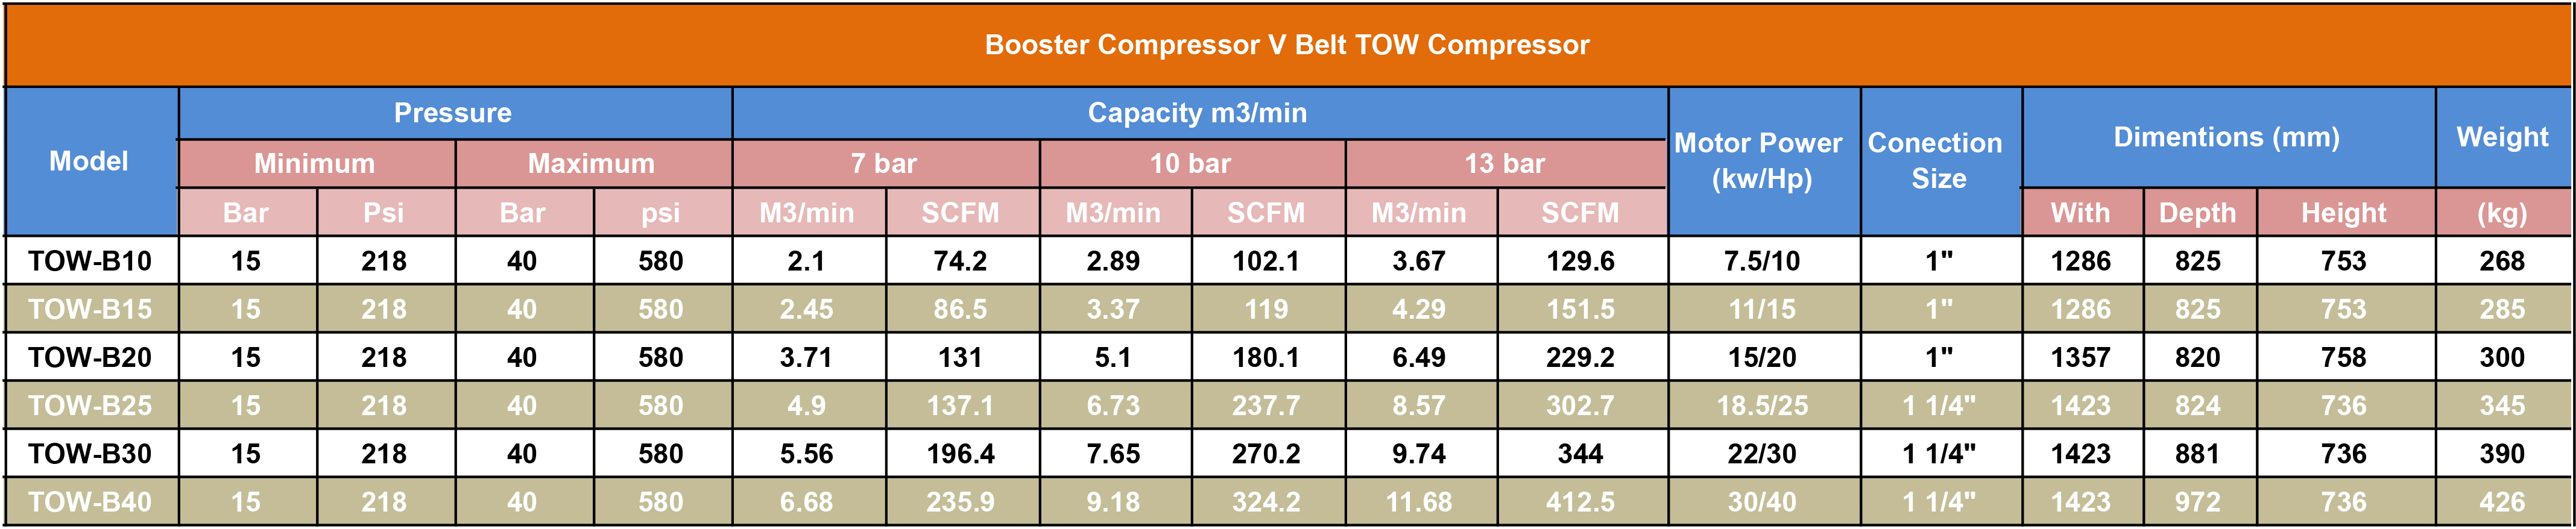 booster v belt - بوستر کمپرسور تسمه ای